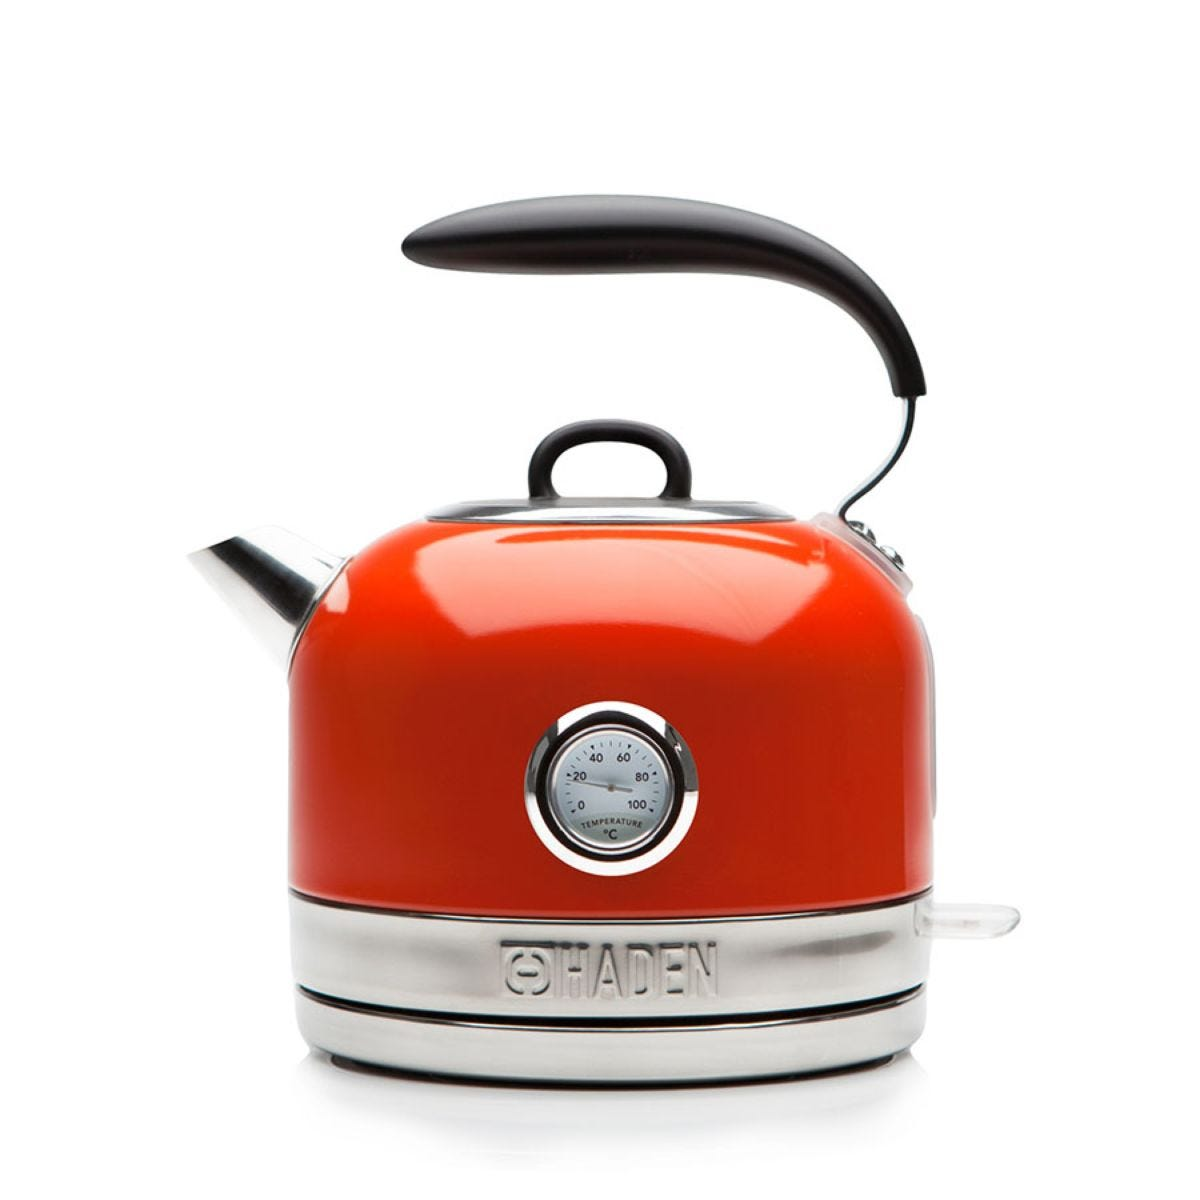 Haden 188847 Jersey Fast Boil 1.5L Cordless Retro Dome Kettle - Marmalade